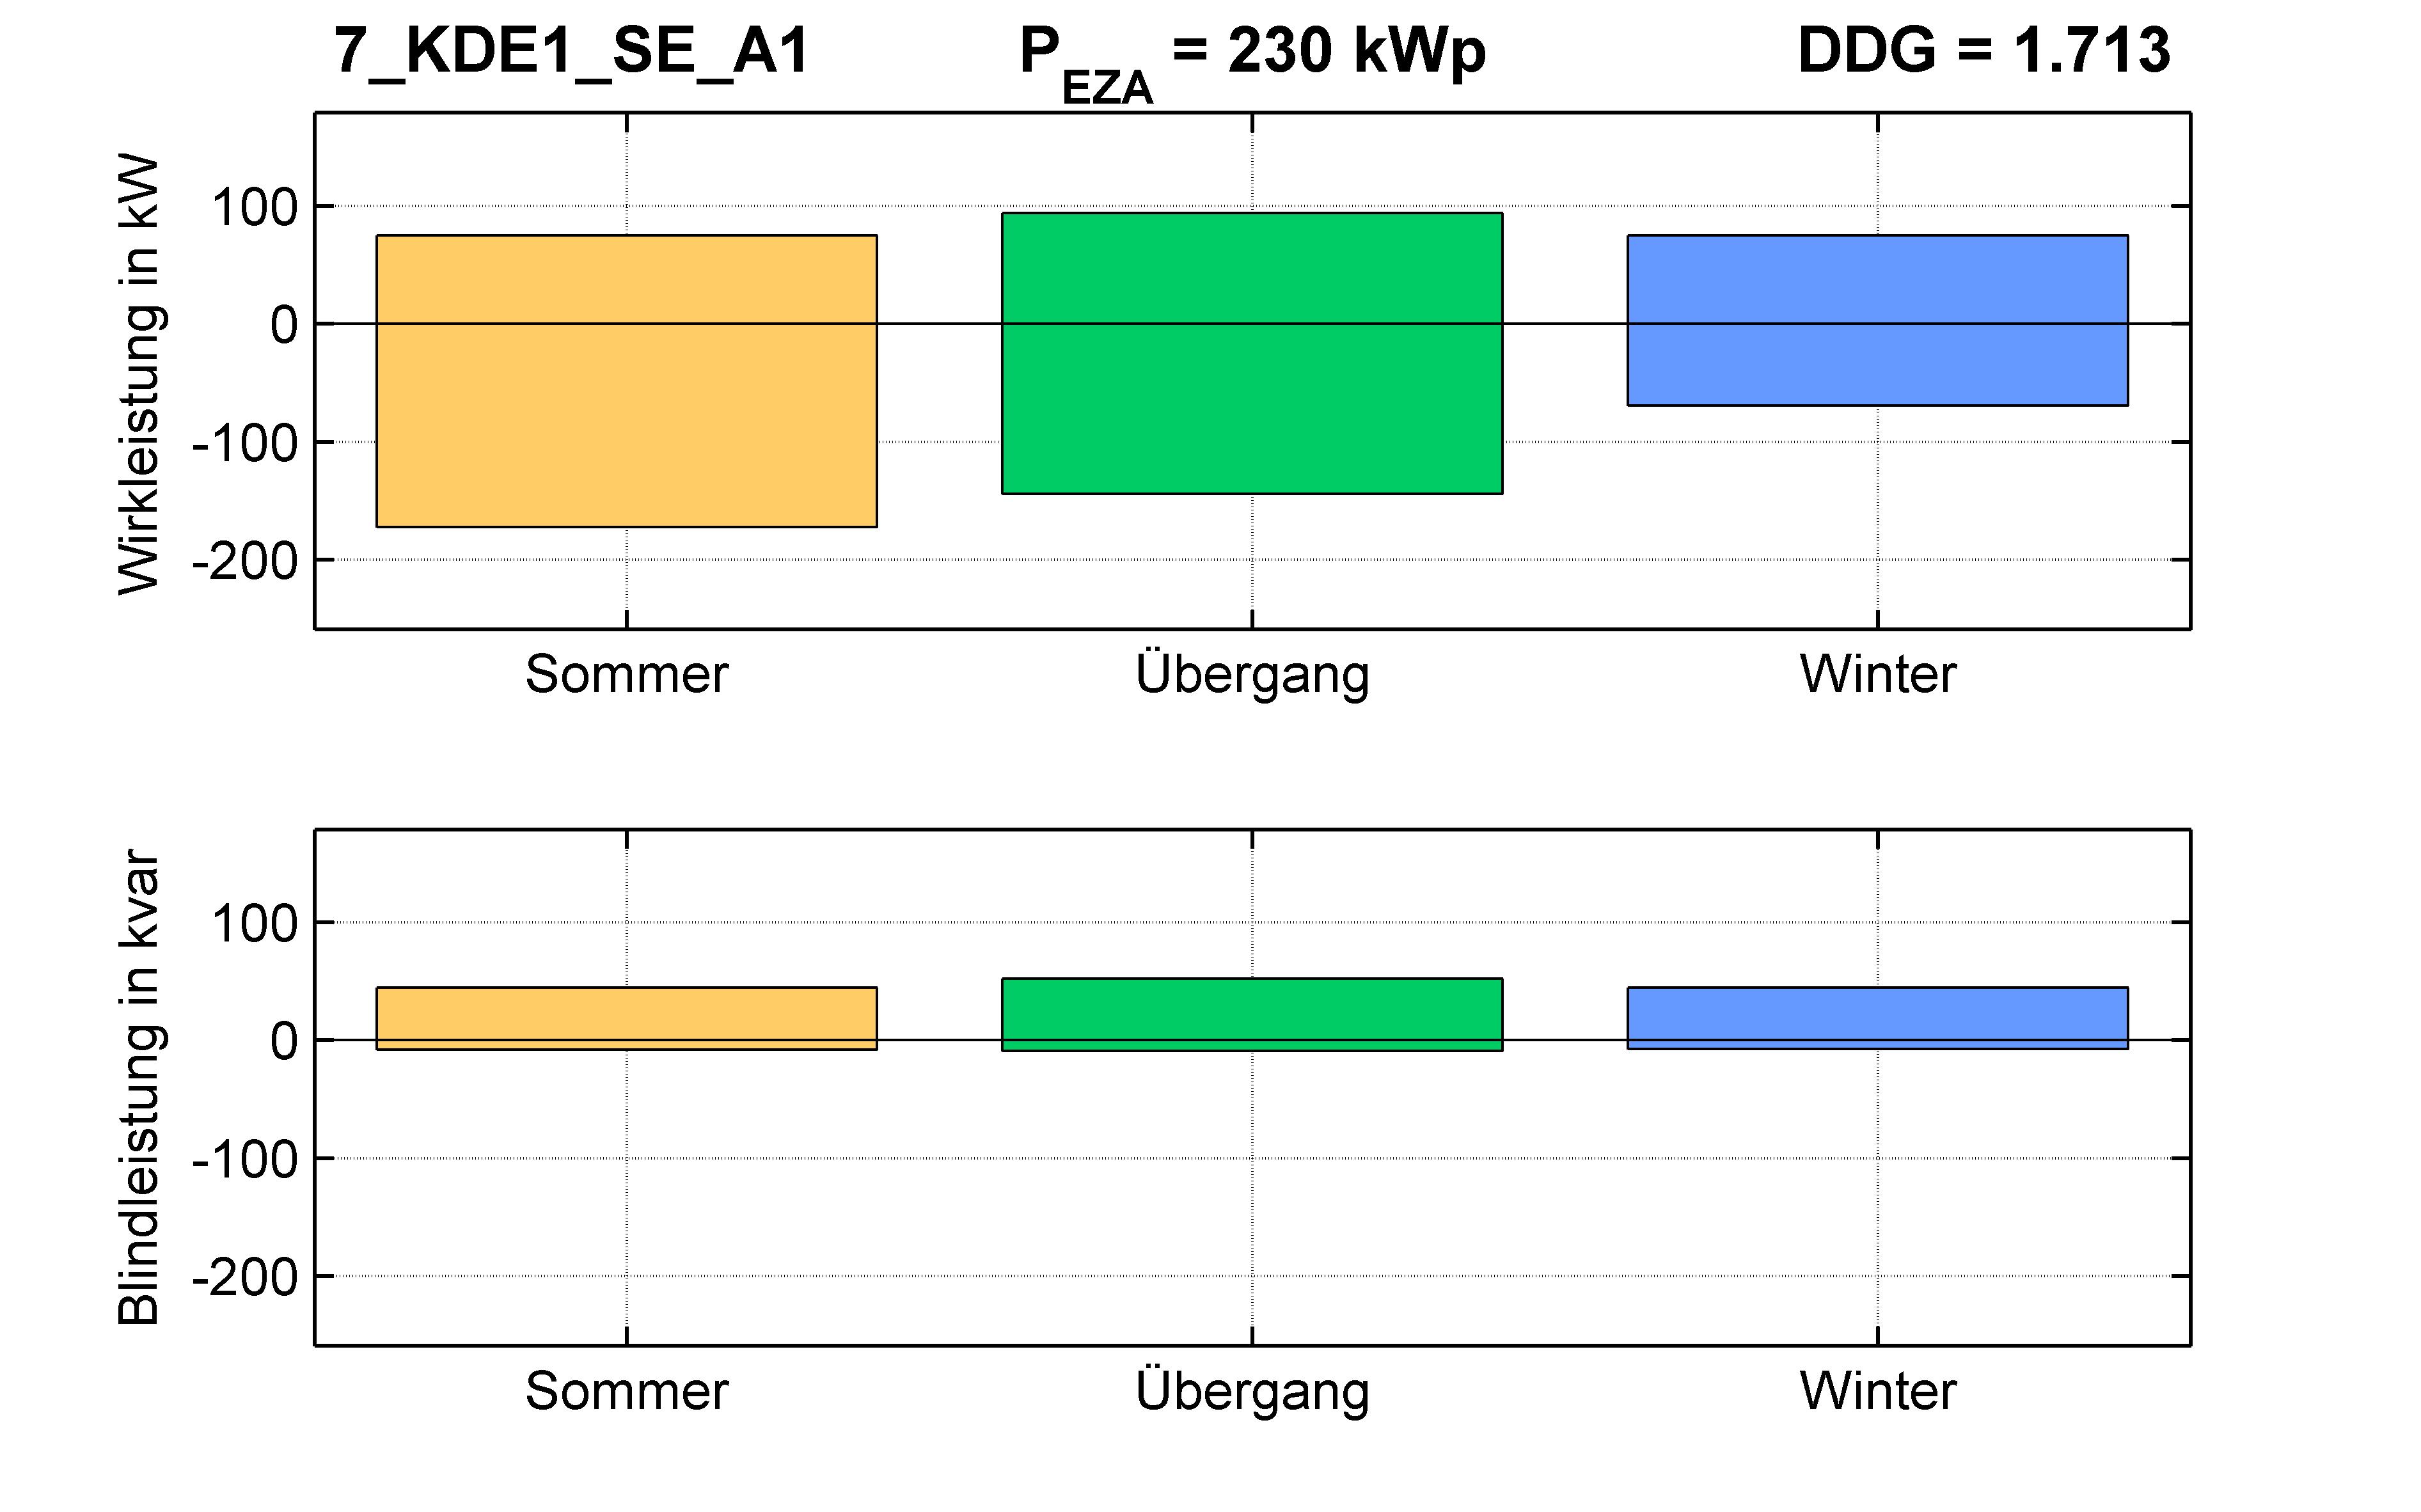 KDE1 | Längsregler (SE) A1 | PQ-Bilanz